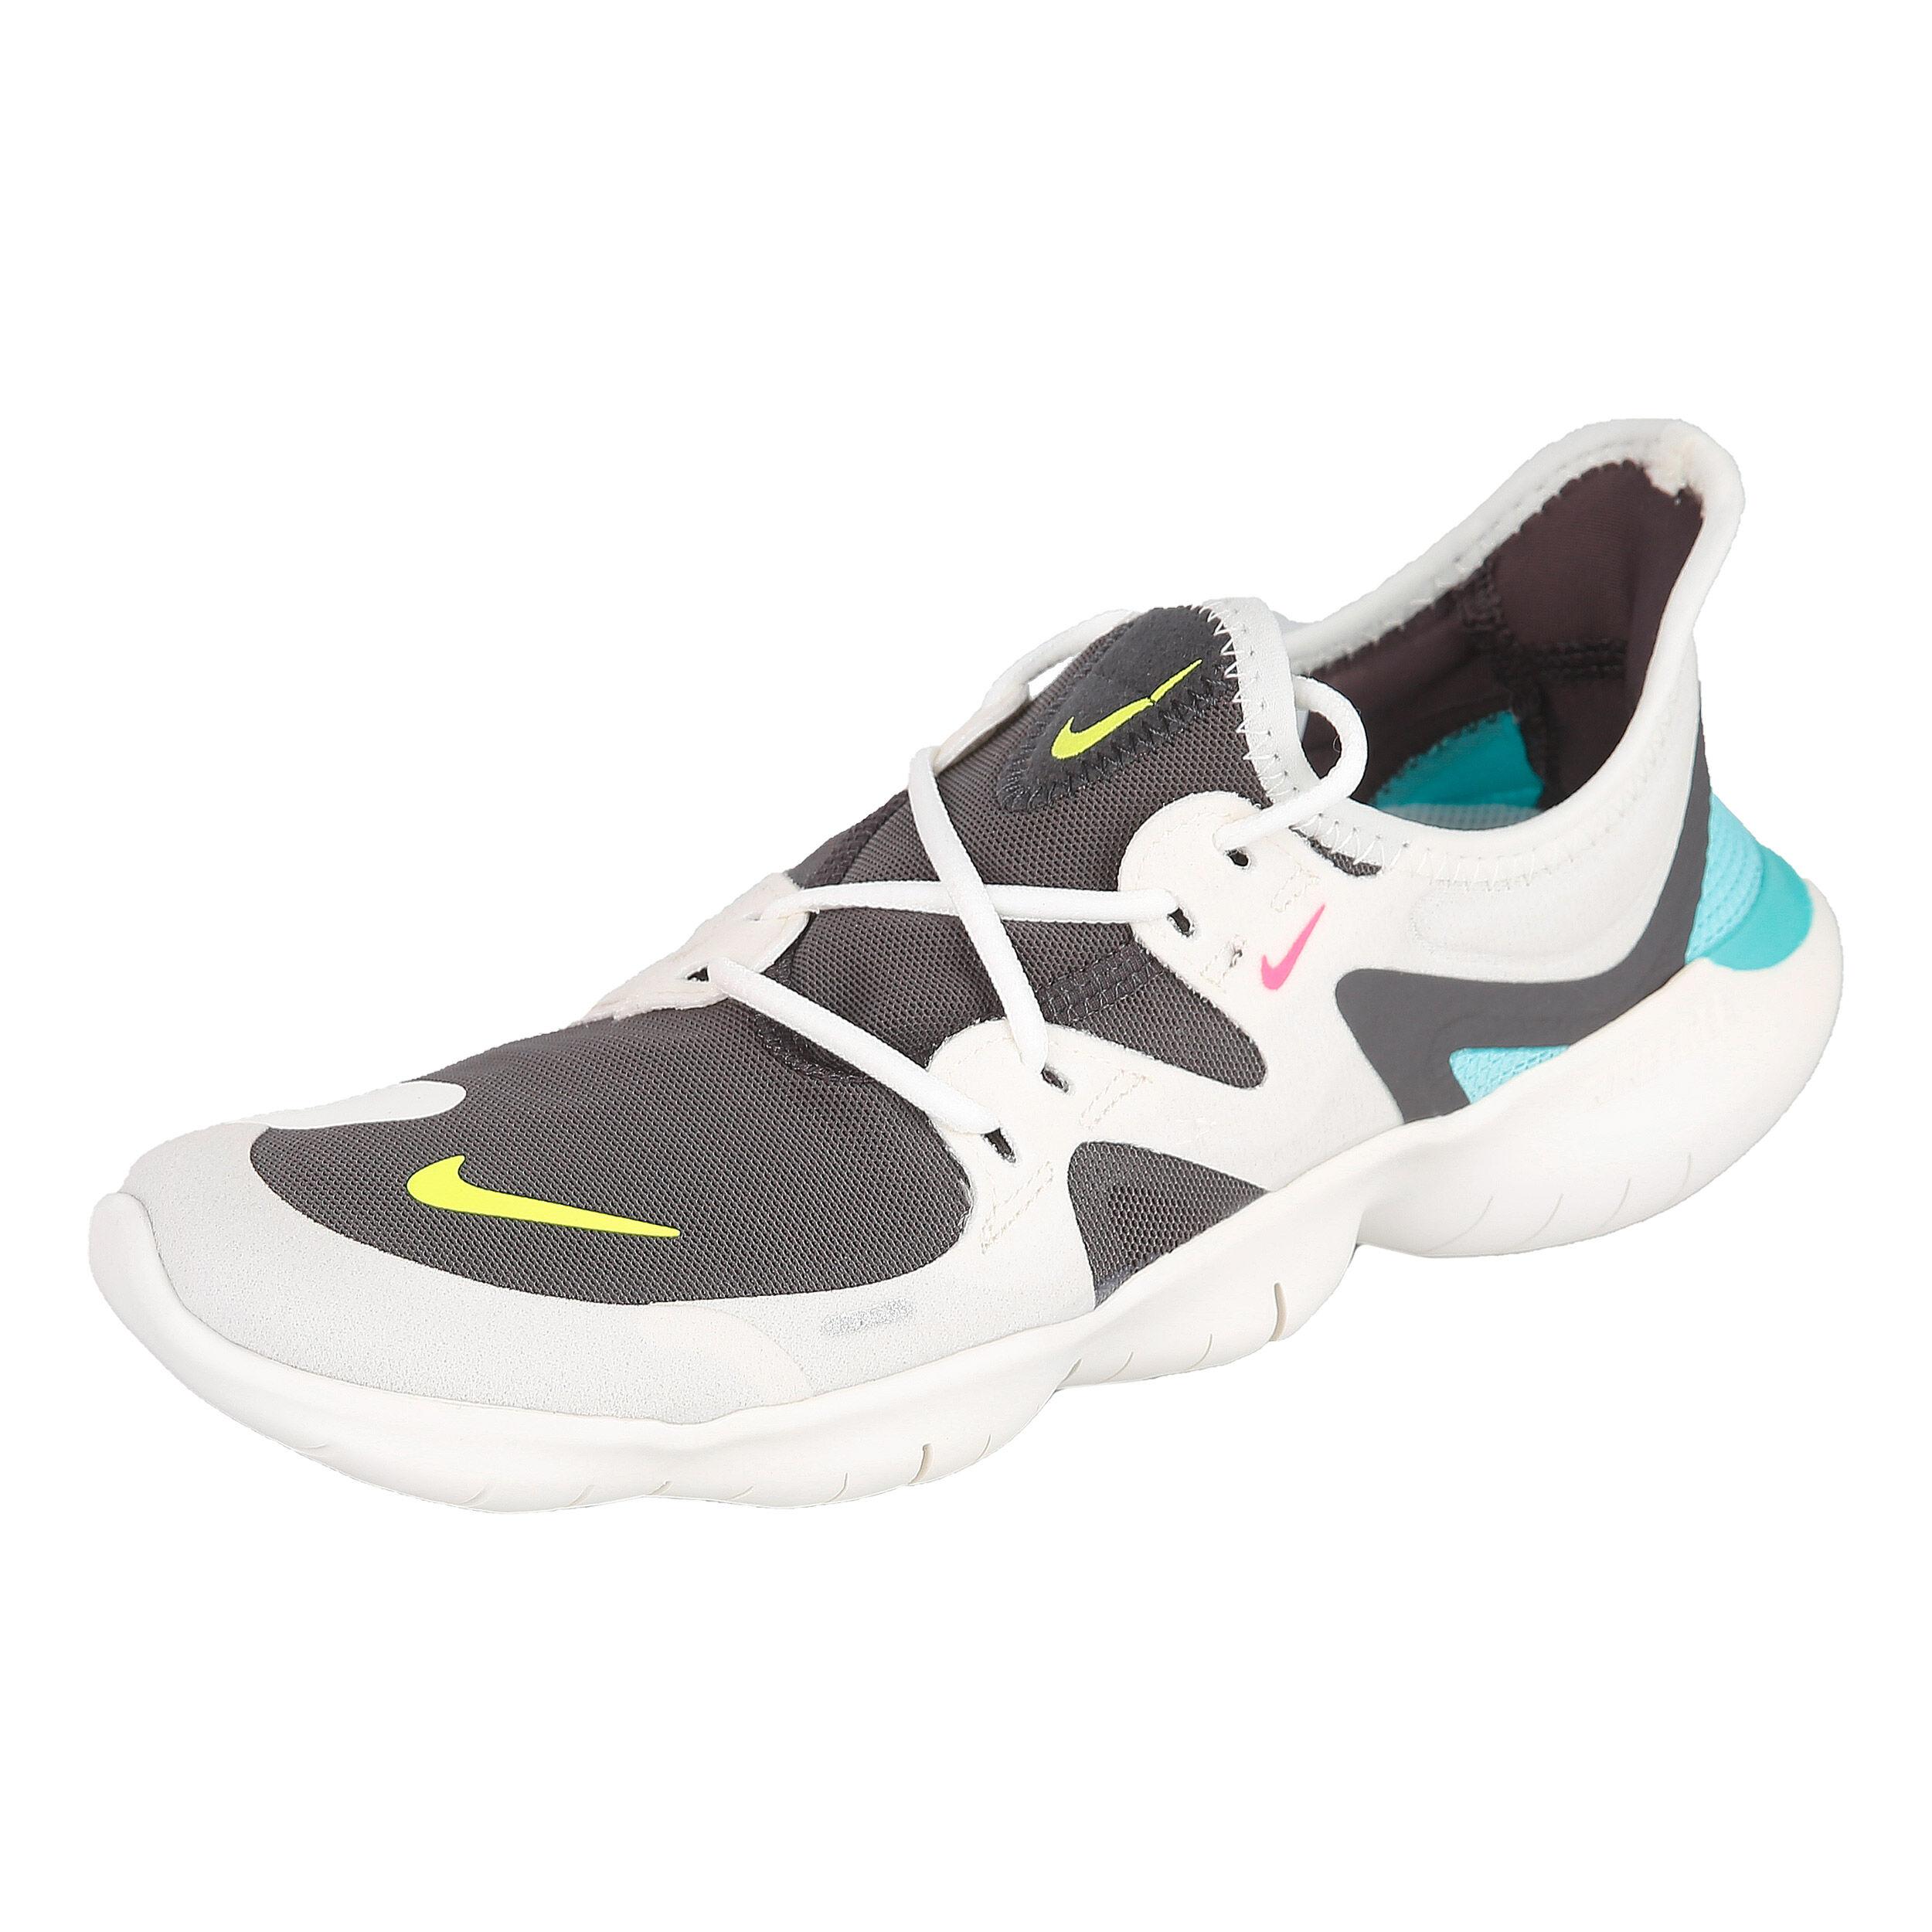 Nike Free 5.0 Neutralschuh Damen Creme, Schwarz